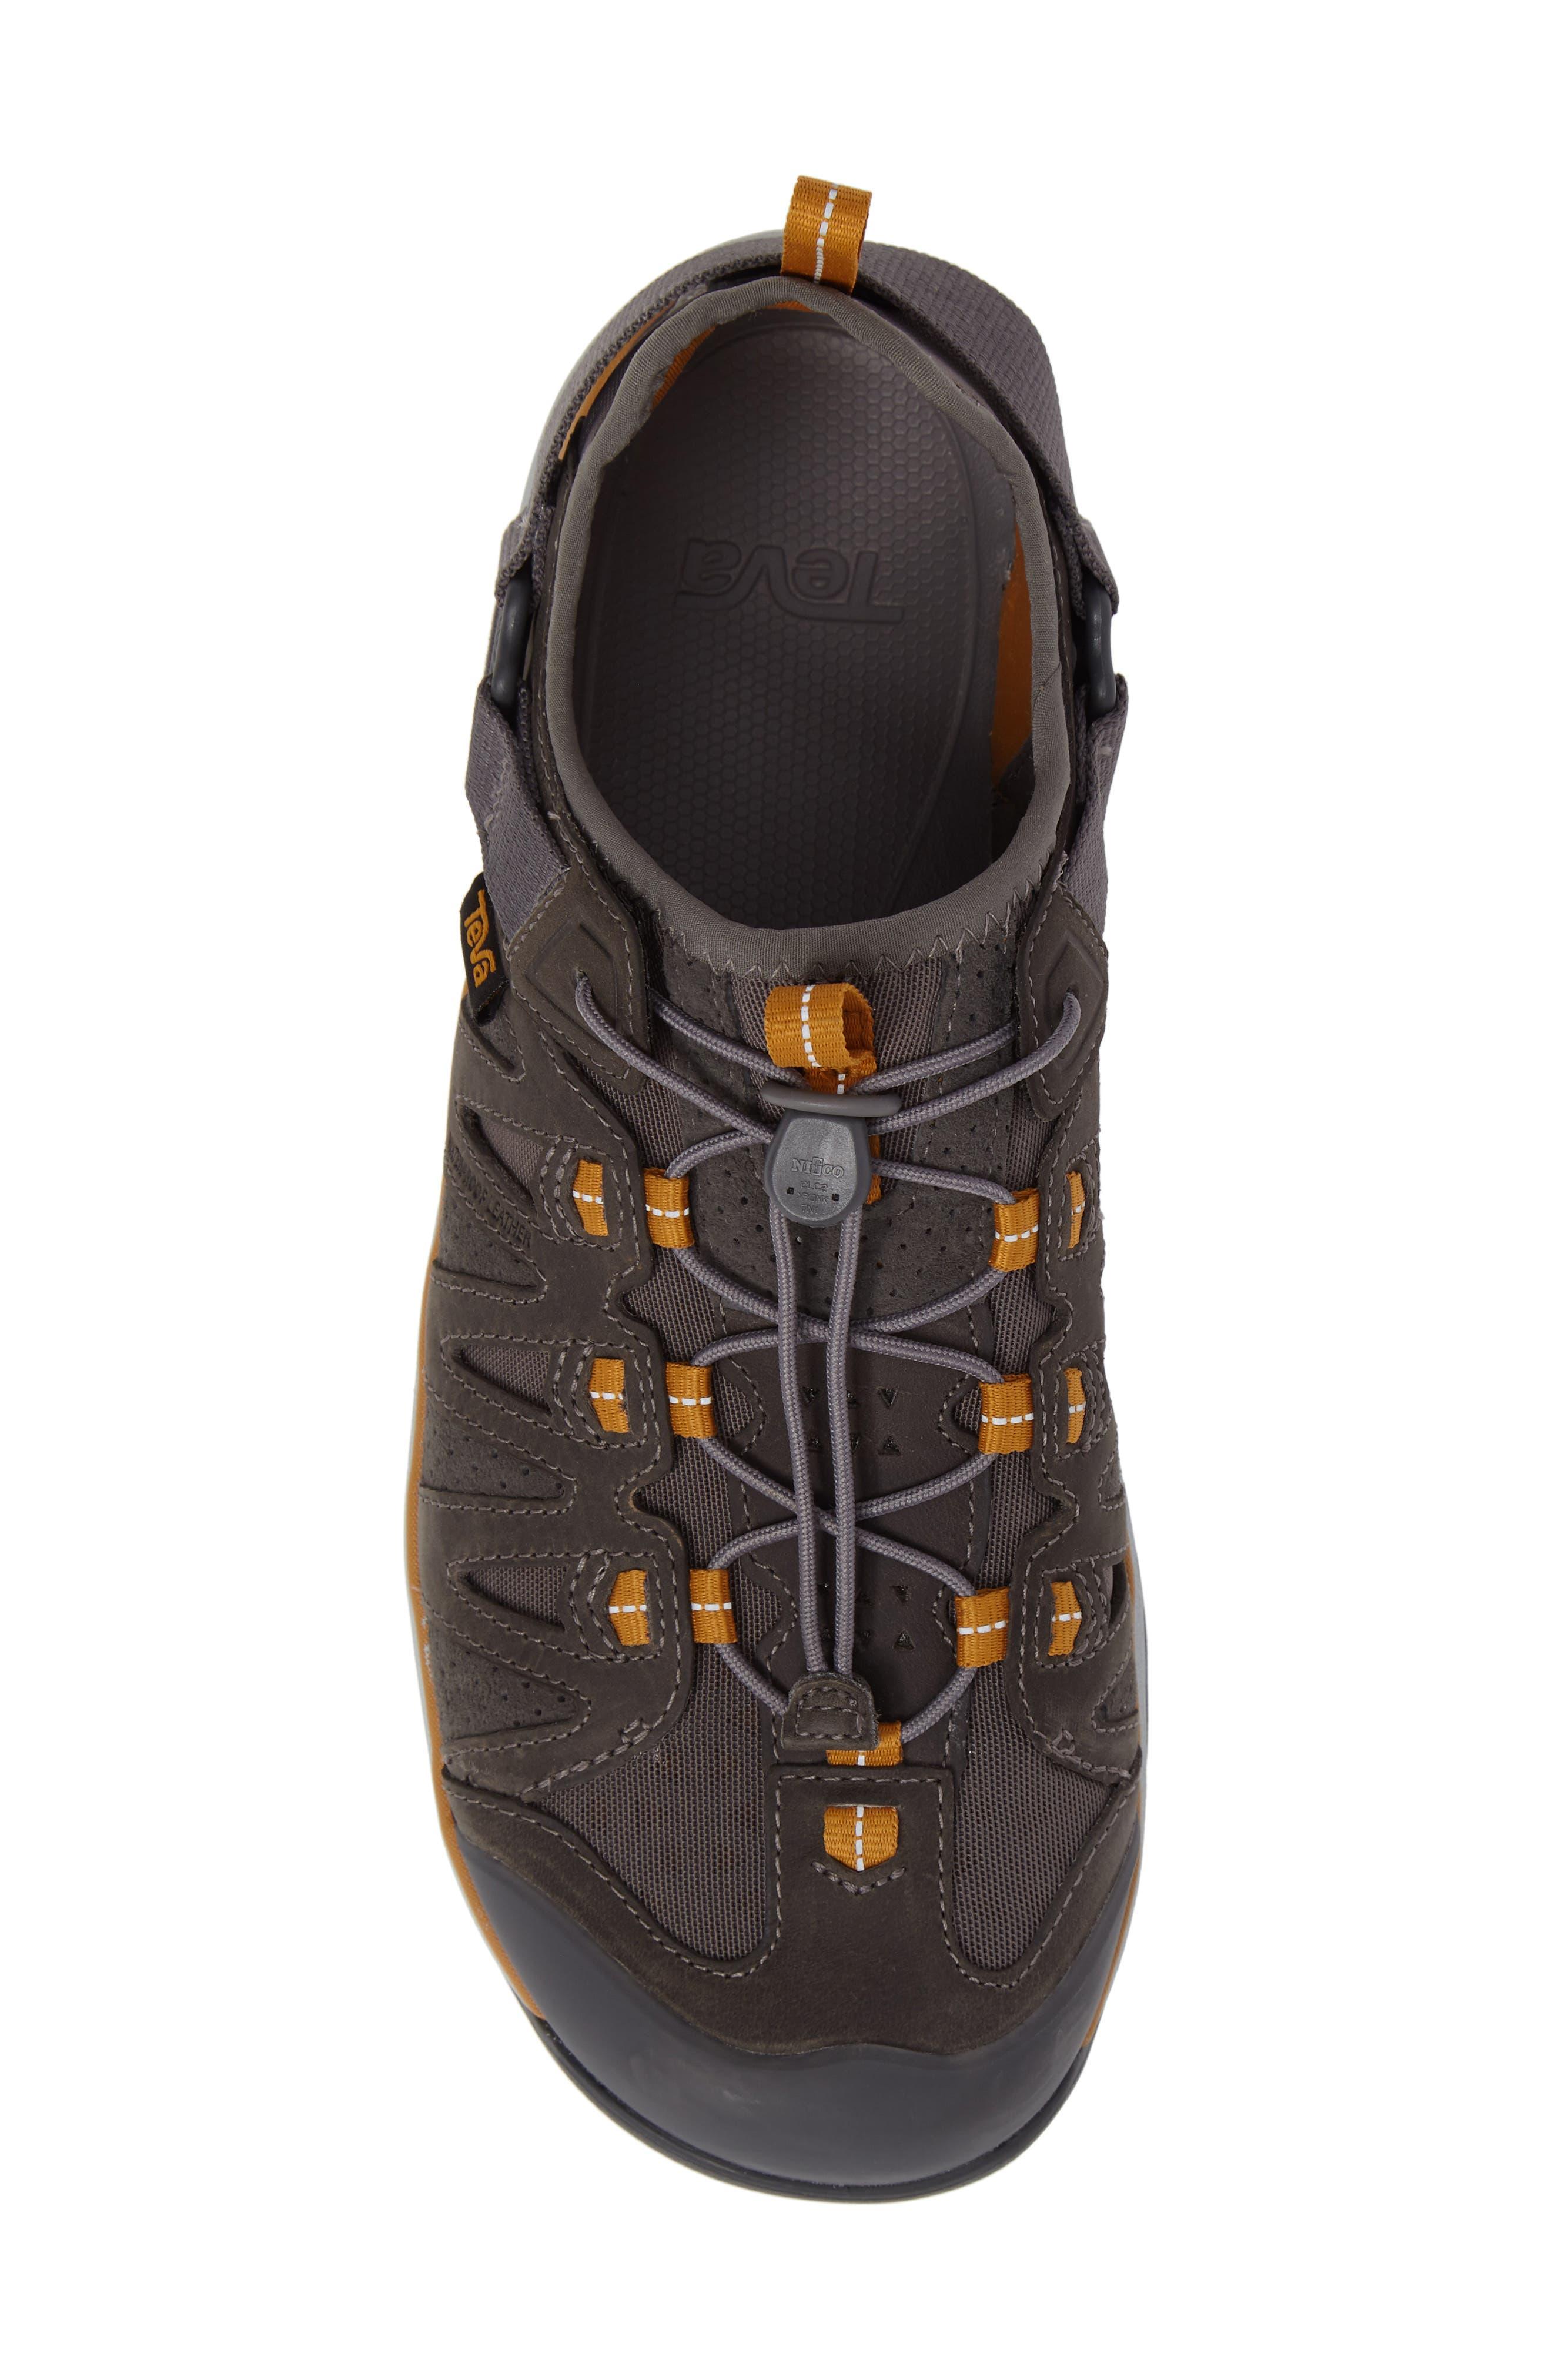 Terra Float Active Sandal,                             Alternate thumbnail 5, color,                             060